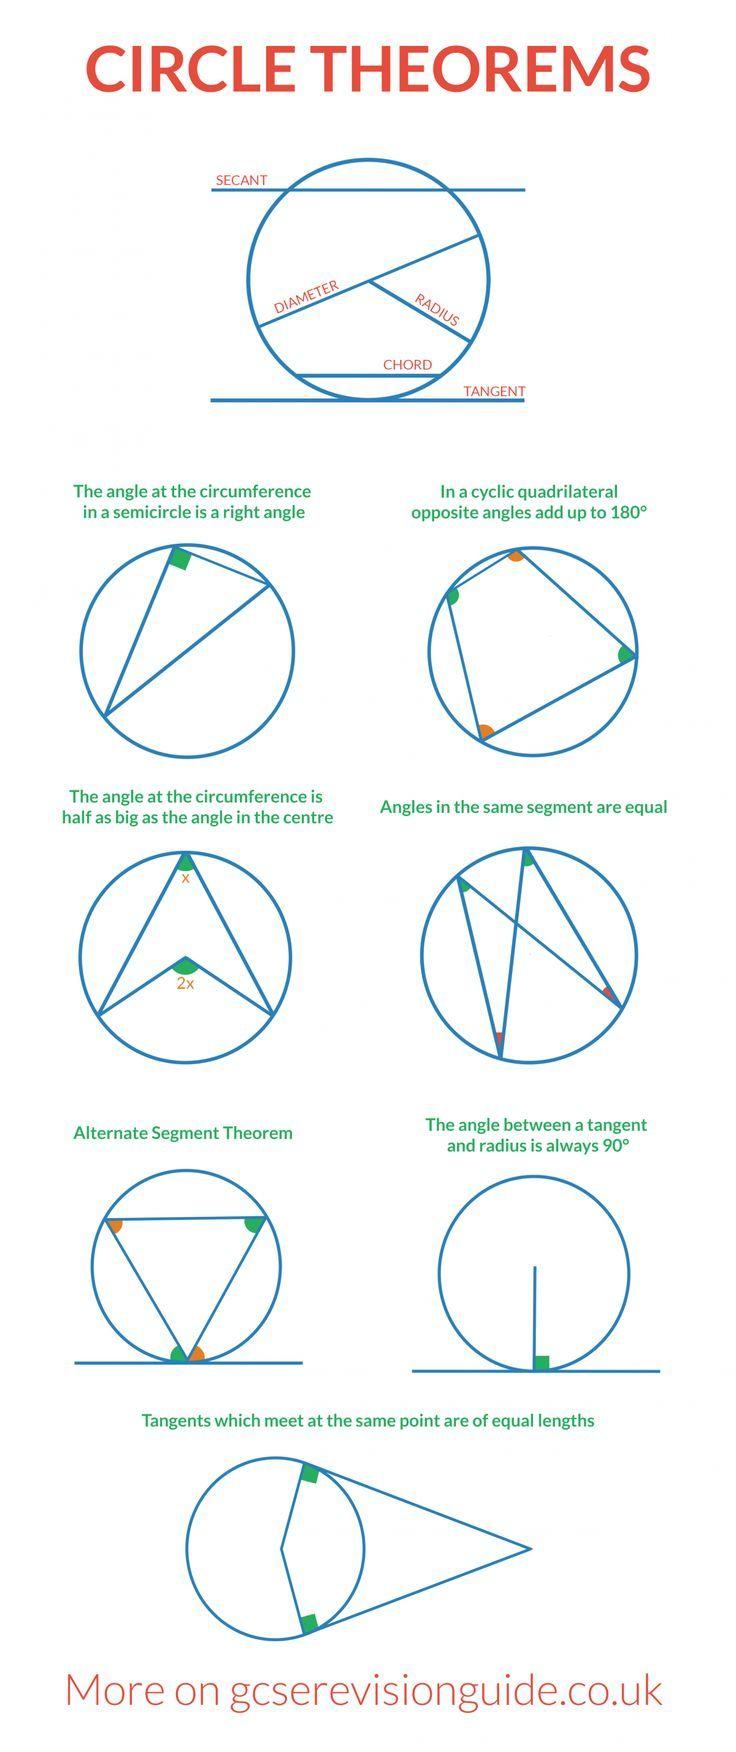 Circle Theorems For Gcse Igcse Gcse Revision Guide Circle Theorems Studying Math Gcse Math